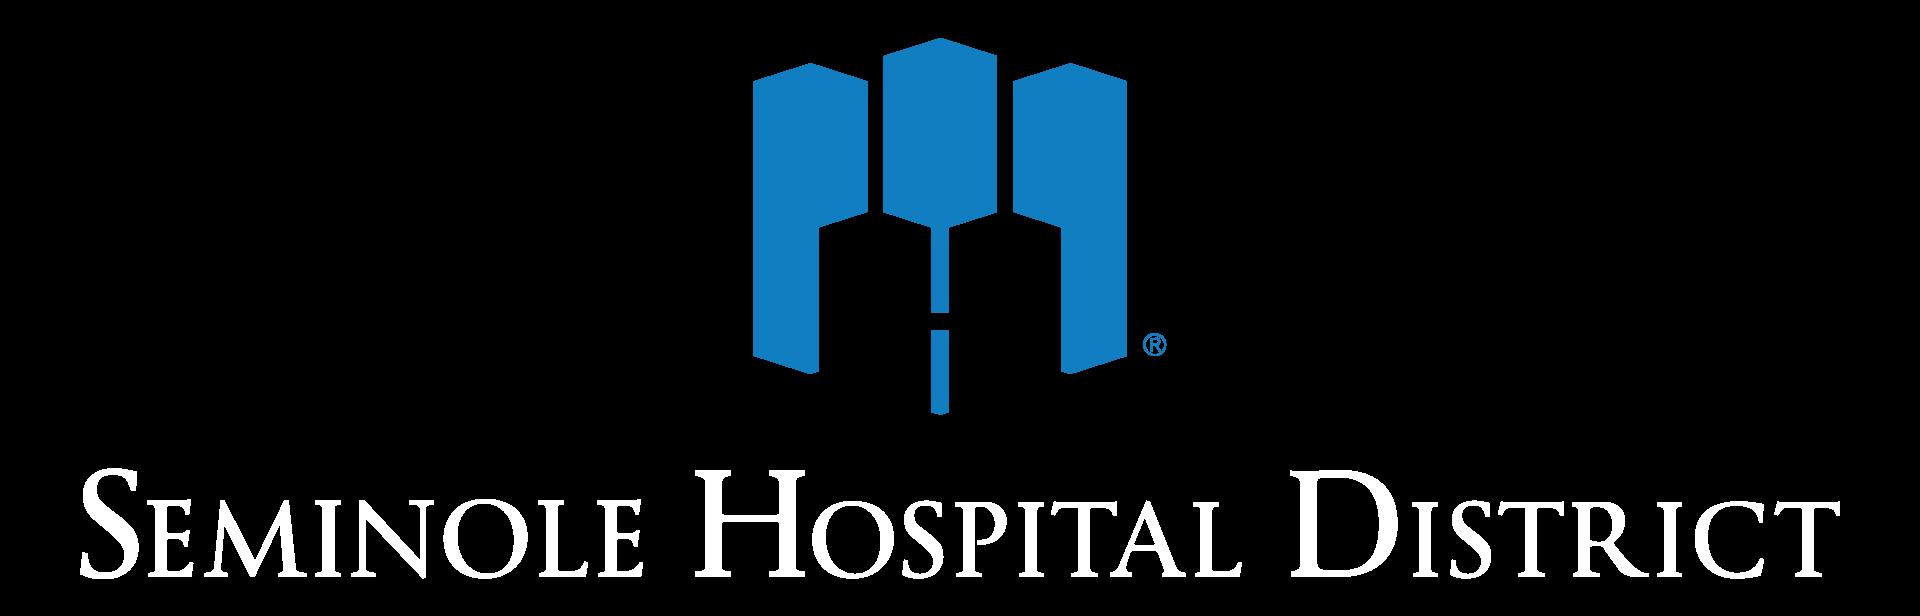 Seminole Hospital District